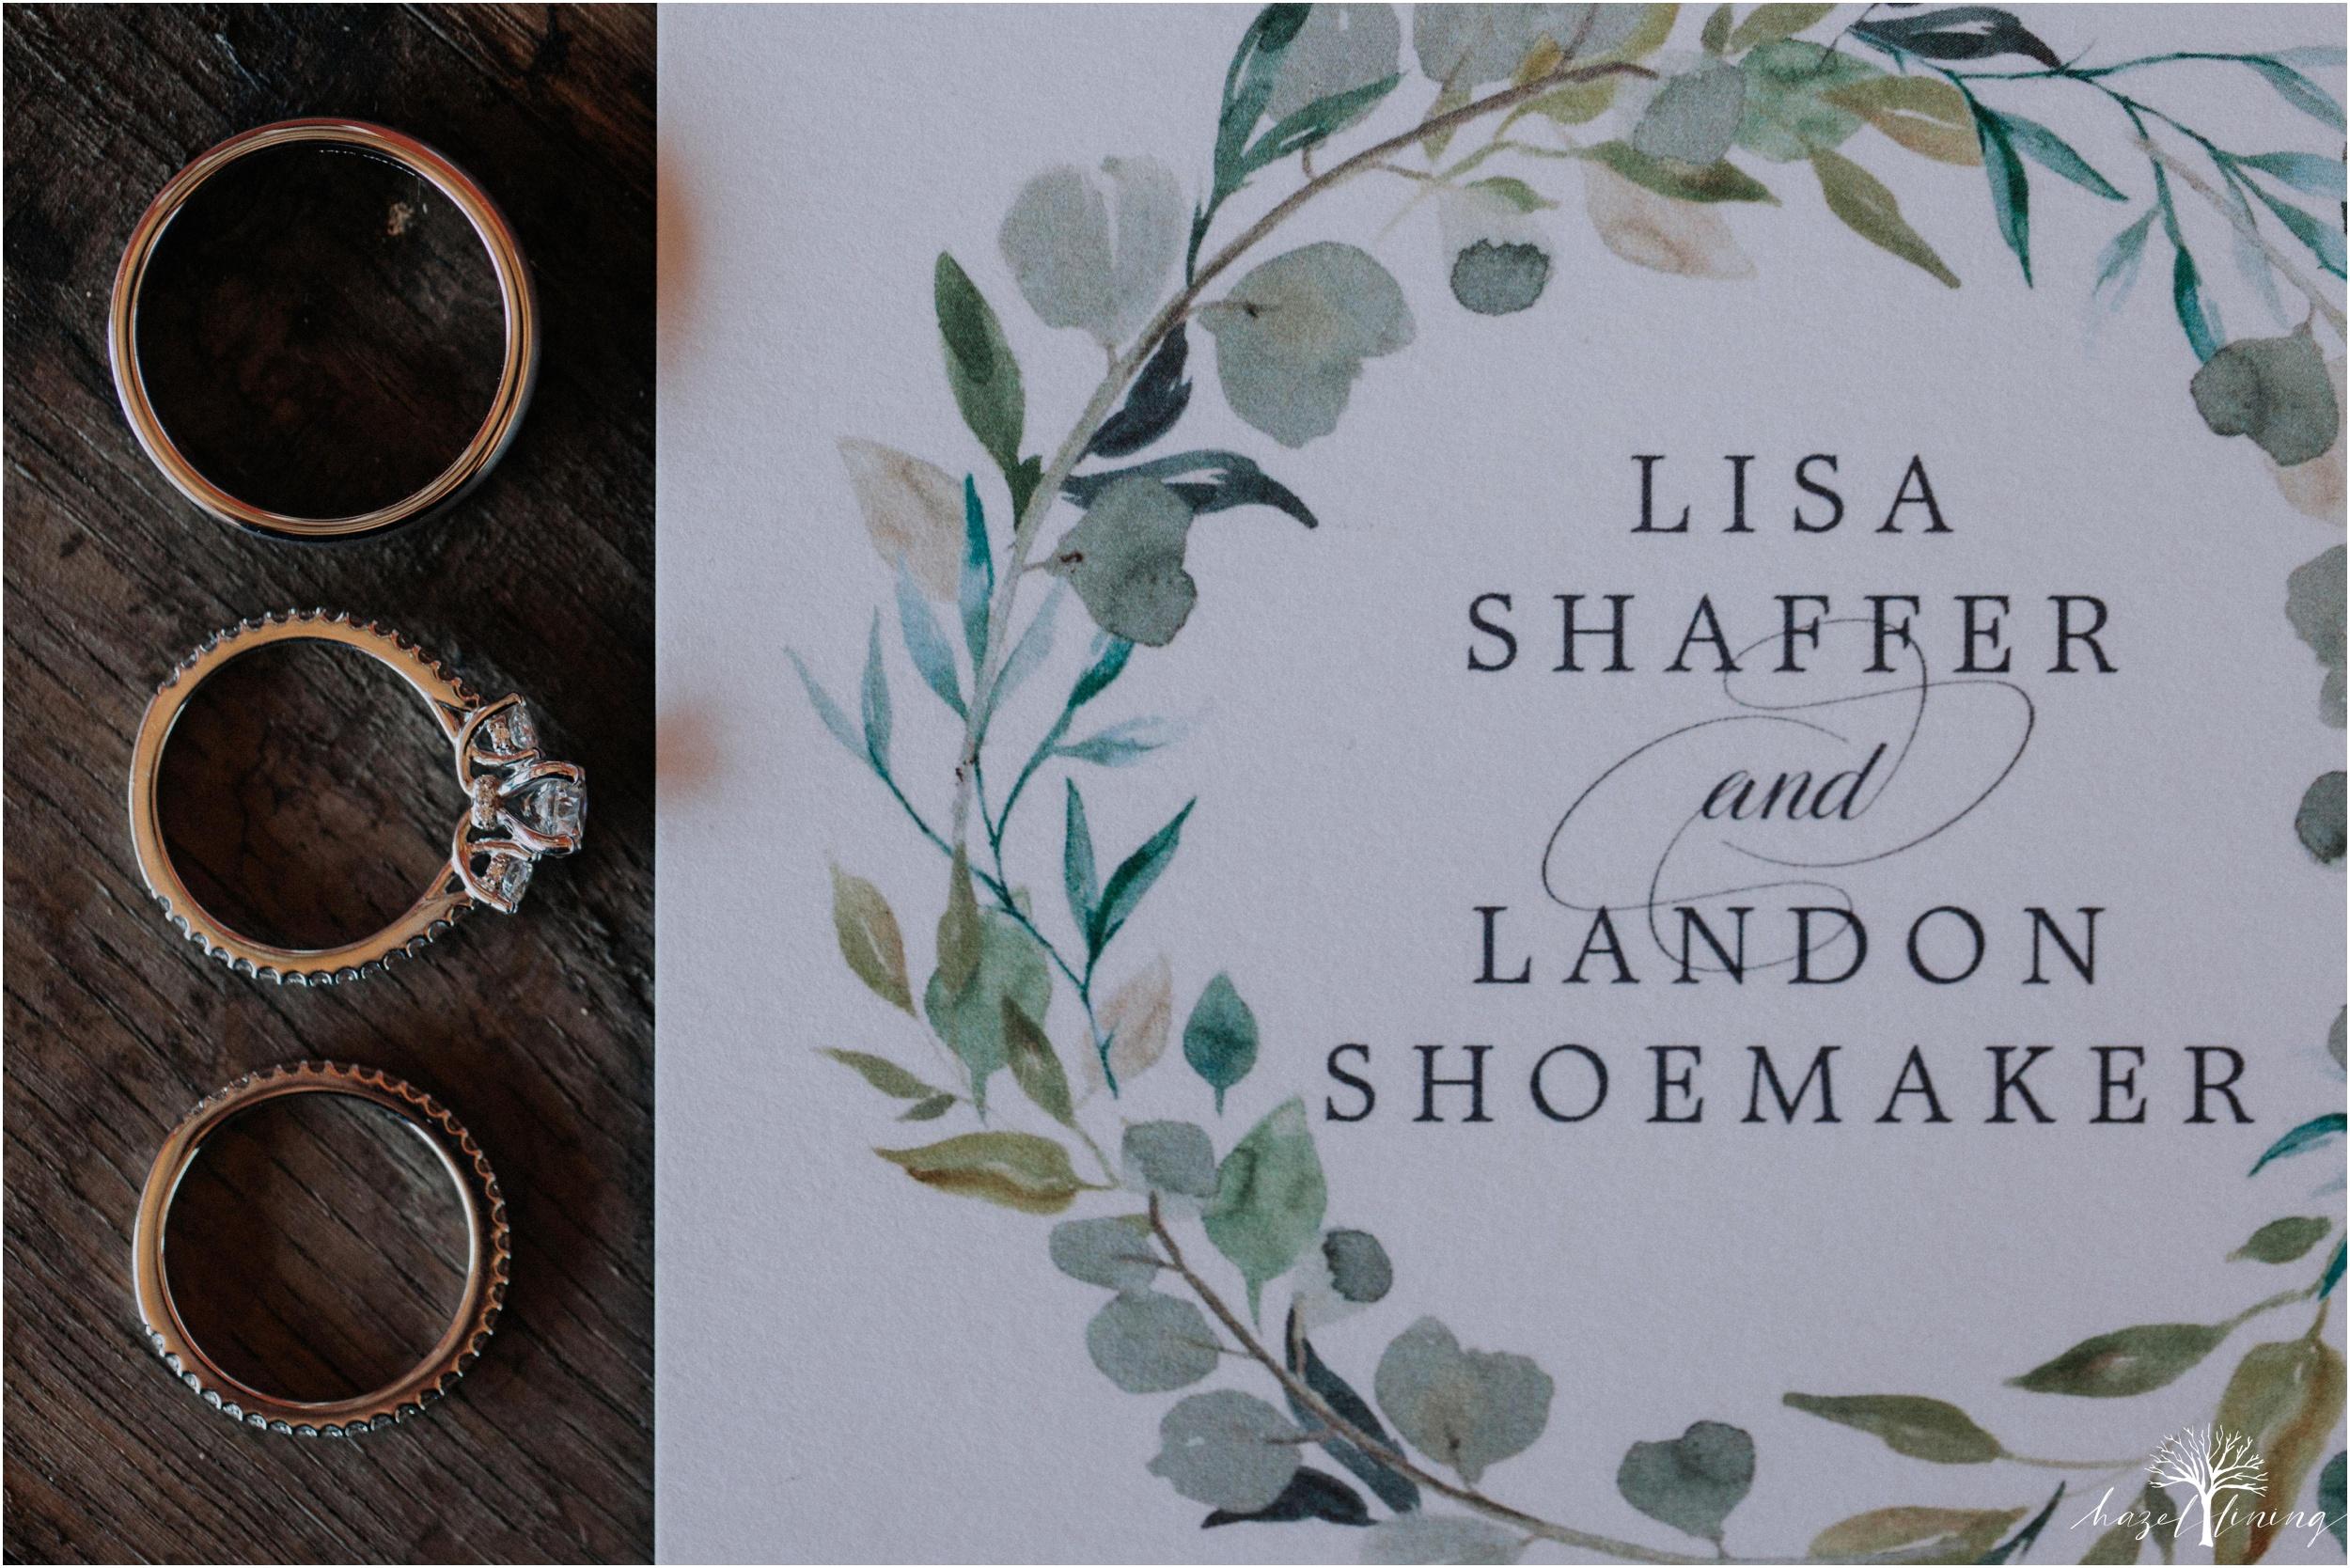 hazel-lining-travel-wedding-elopement-photography-lisa-landon-shoemaker-the-farm-bakery-and-events-bucks-county-quakertown-pennsylvania-summer-country-outdoor-farm-wedding_0005.jpg